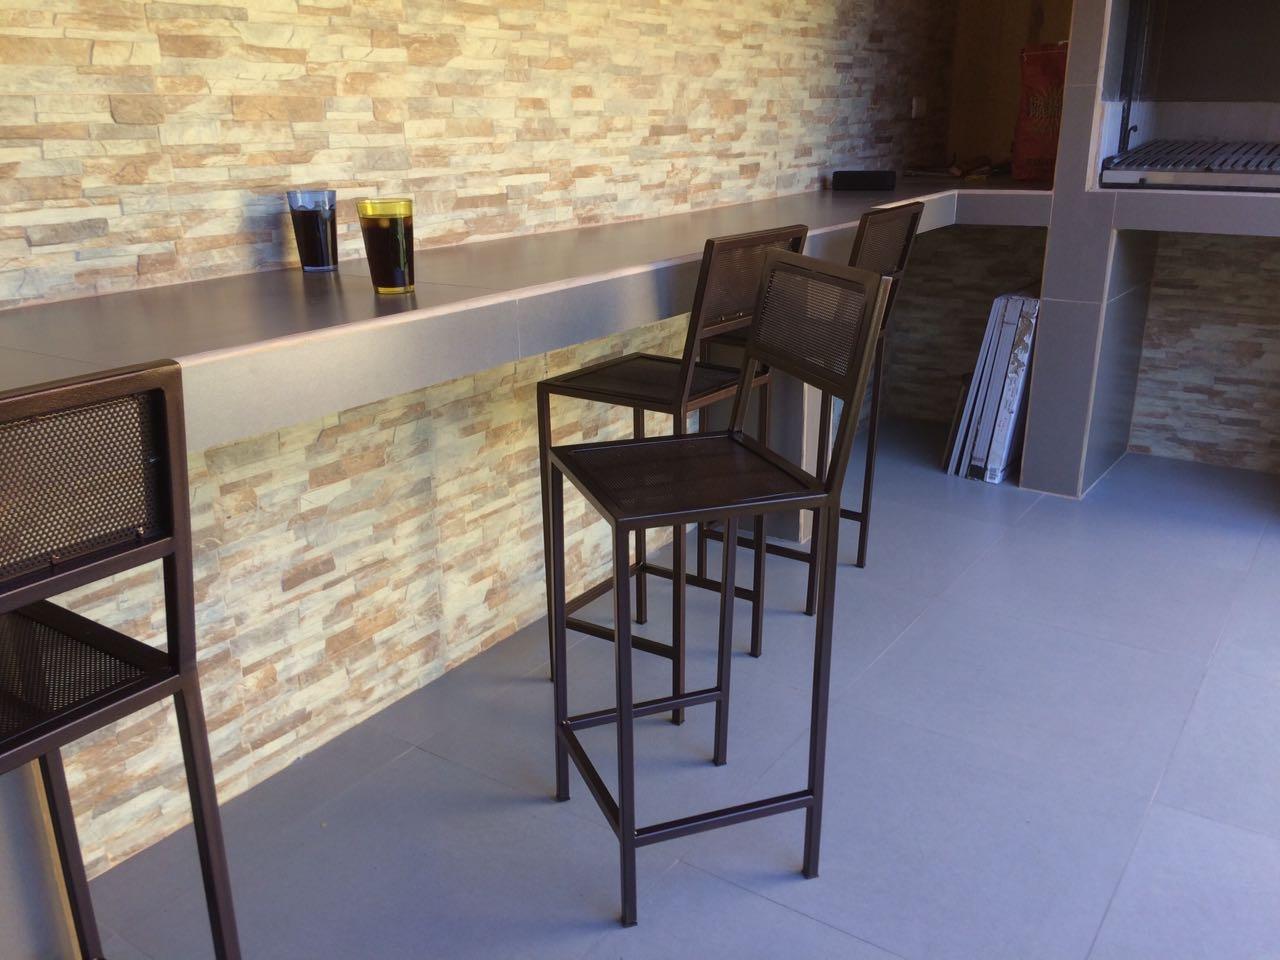 Tabutere metalico fierro a medida pisos bar de terraza - Sillas de piso ...